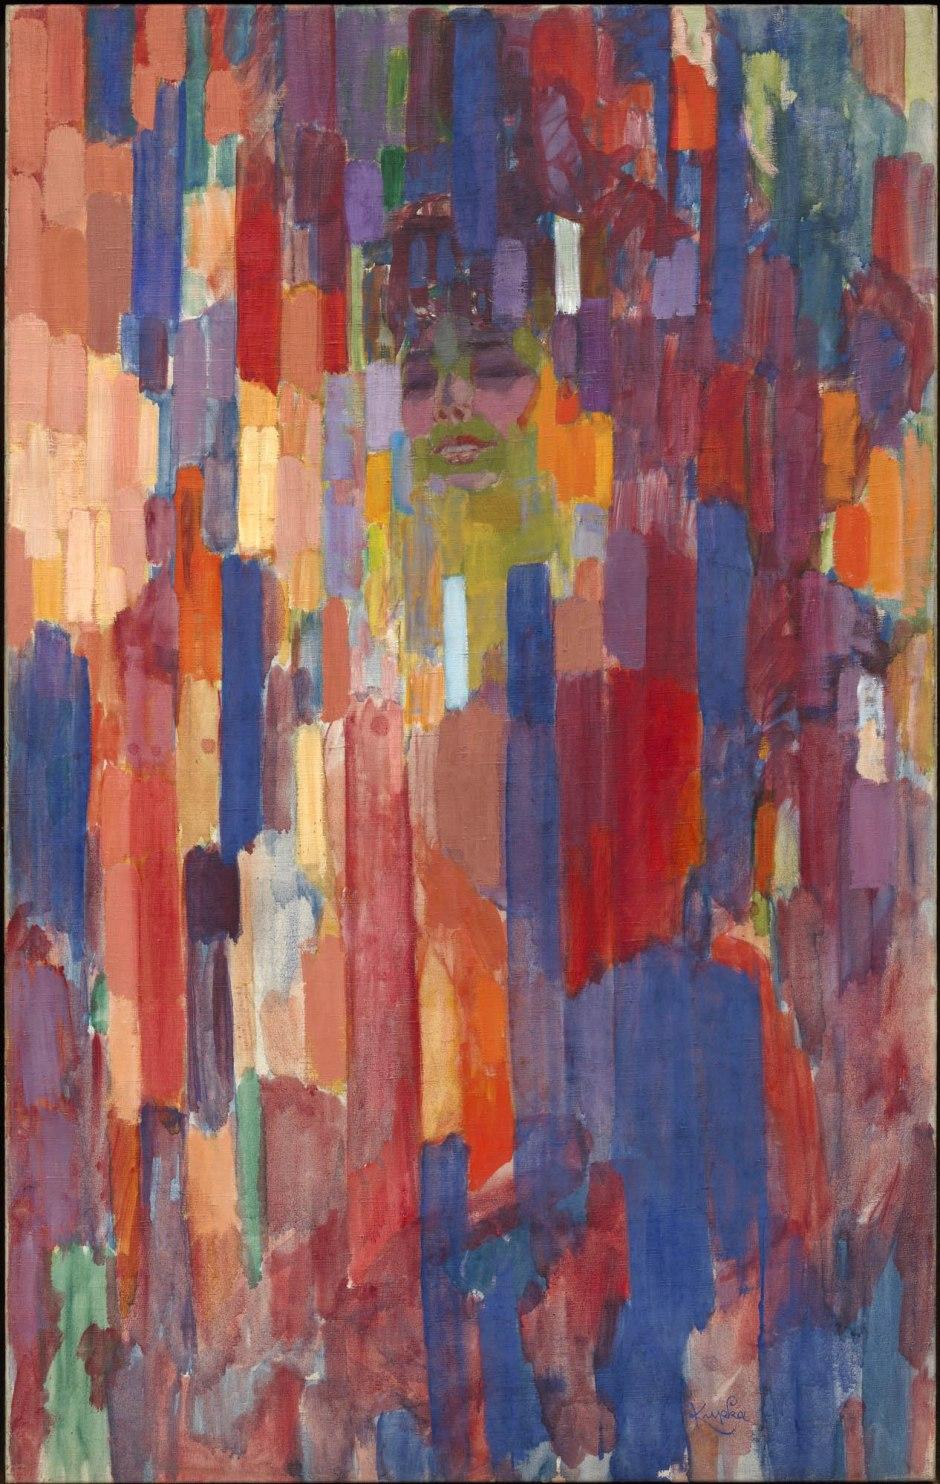 Frantisek Kupka, Madame Kupka tra verticali, 1910-11